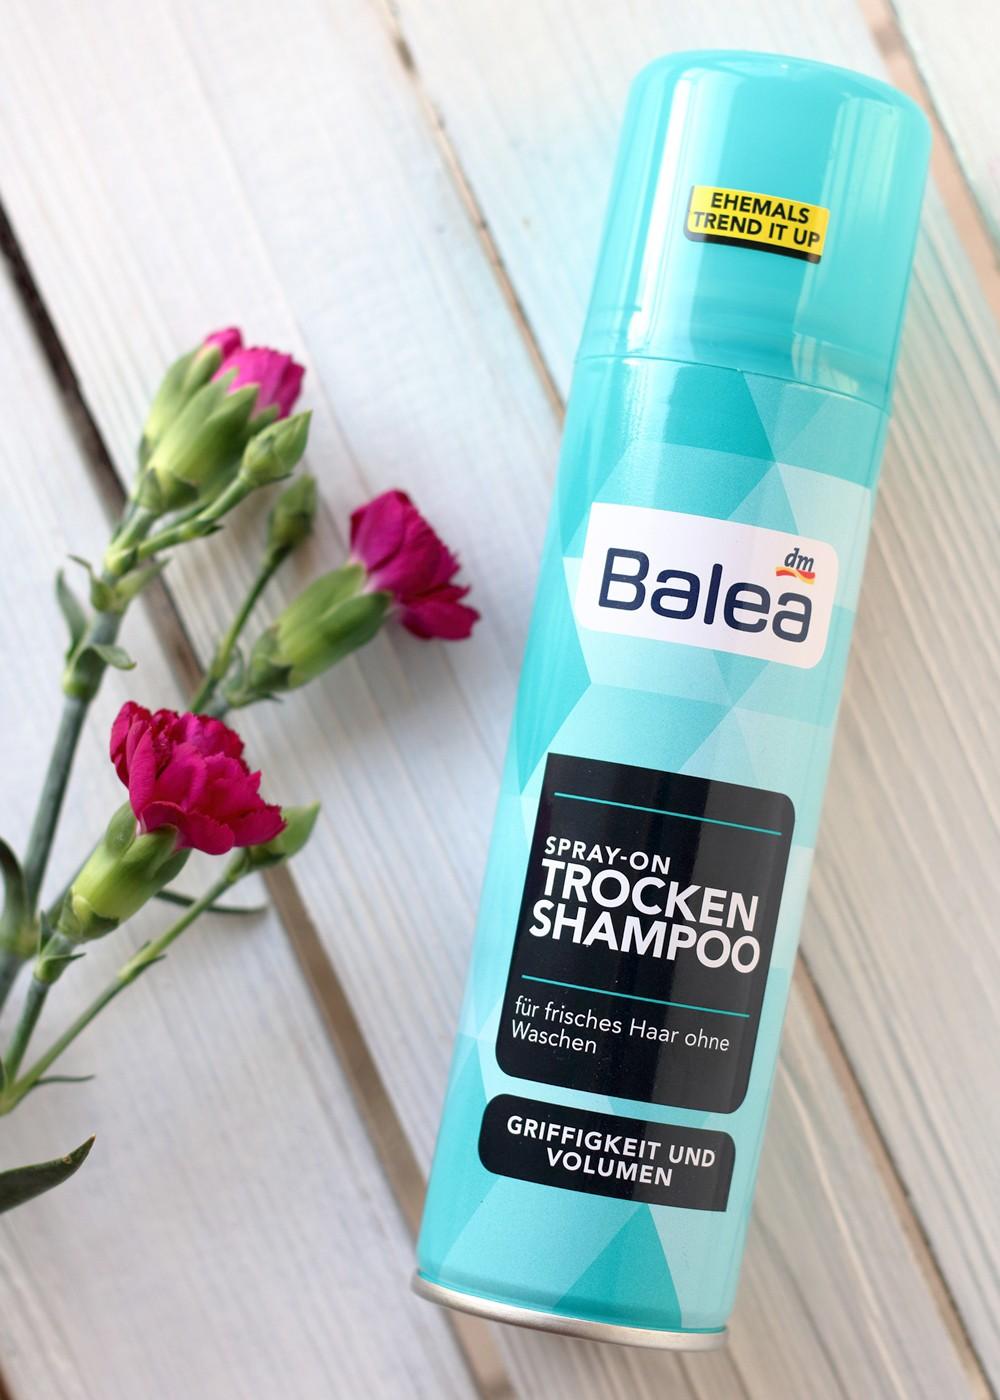 Balea Haarprofis Trockenshampoo